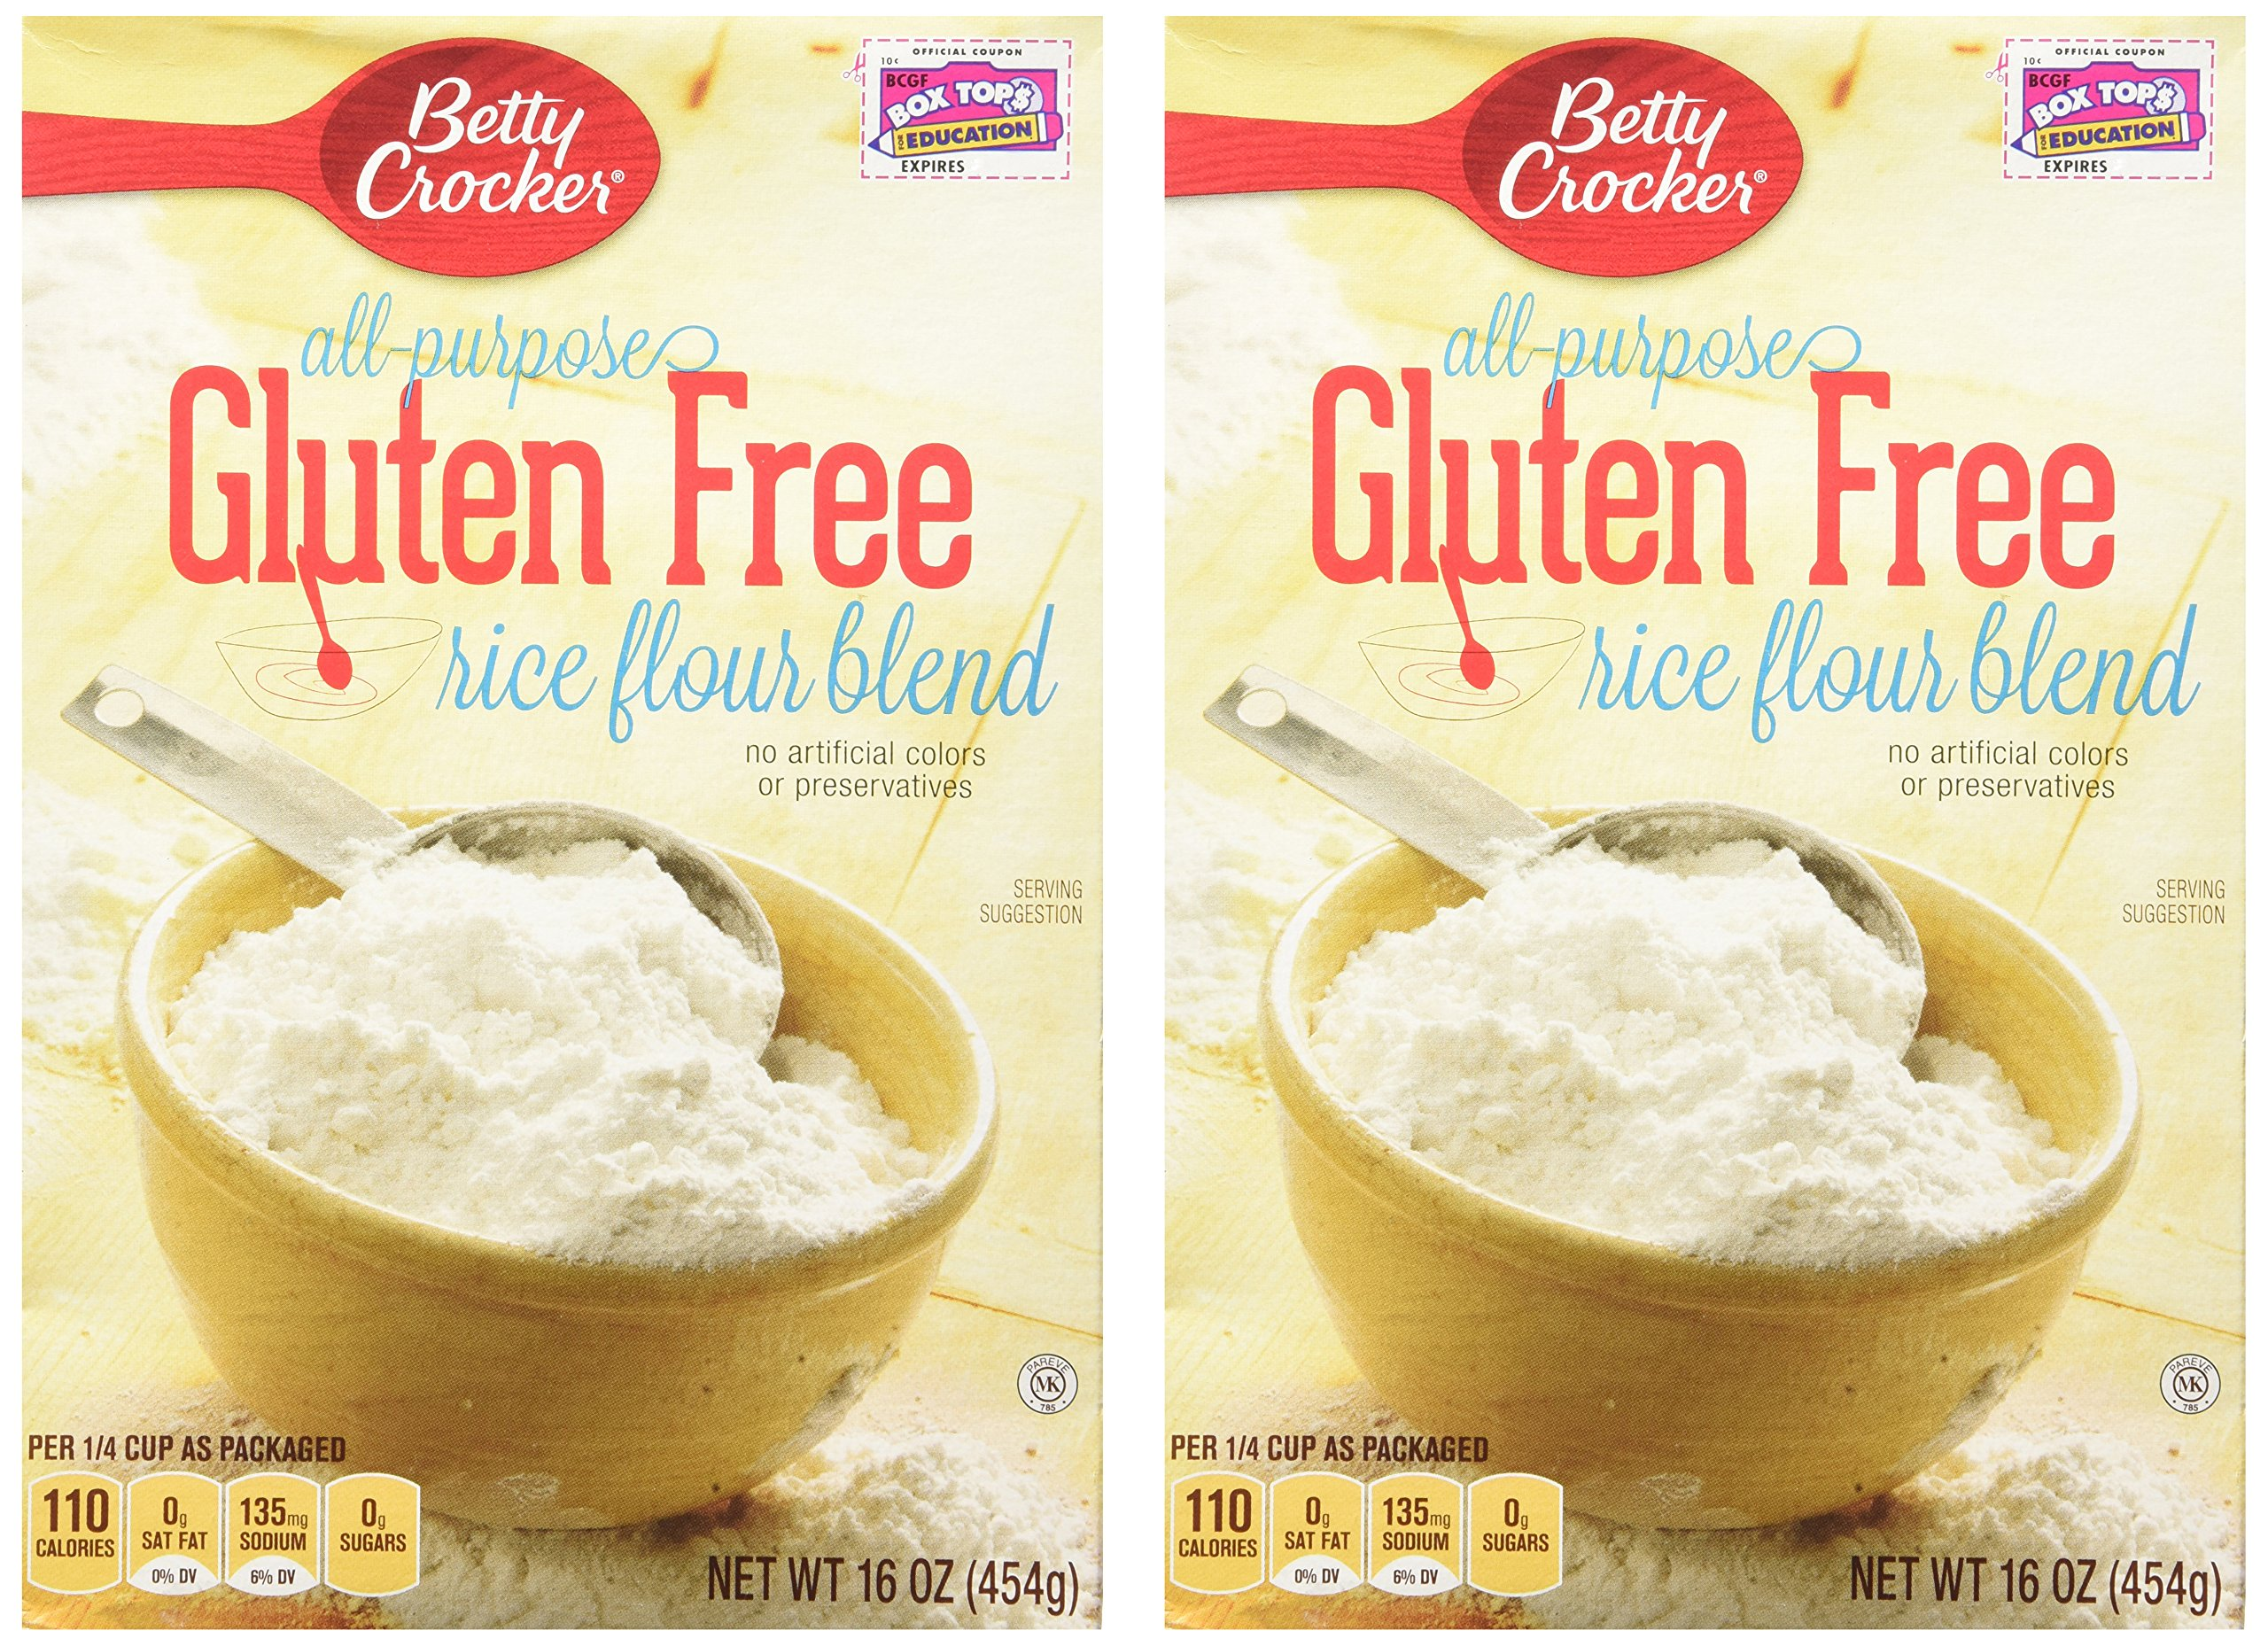 Betty Crocker, Rice Flour Blend, Gluten Free, All-Purpose, 16oz Box (Pack of 2)